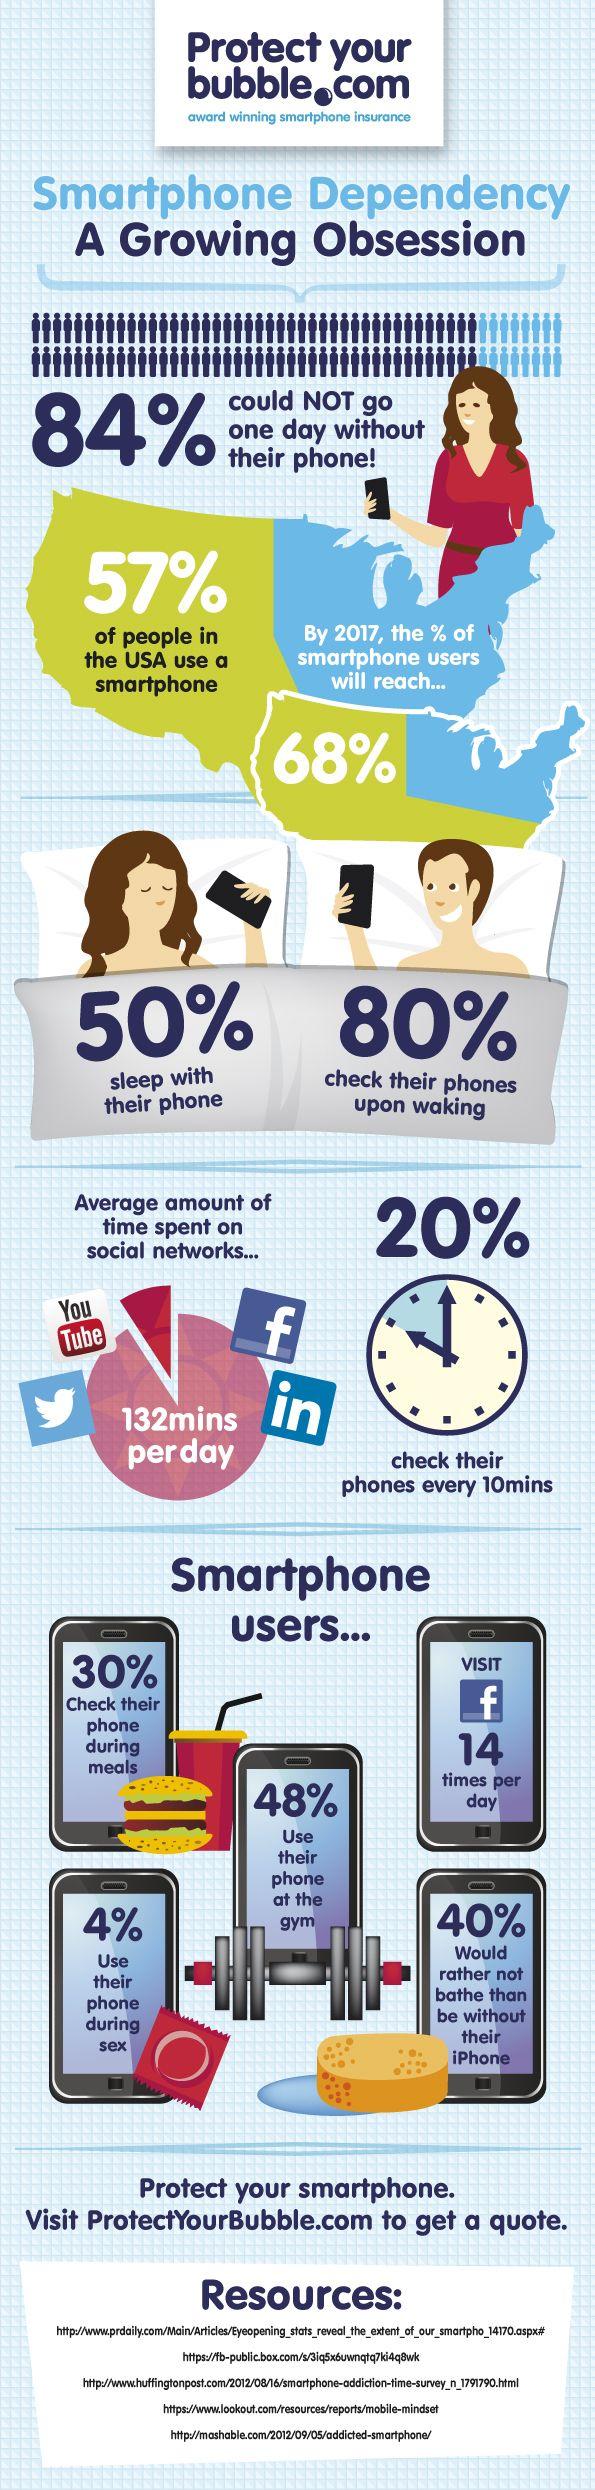 PYB DEPENDANCY infographic V6